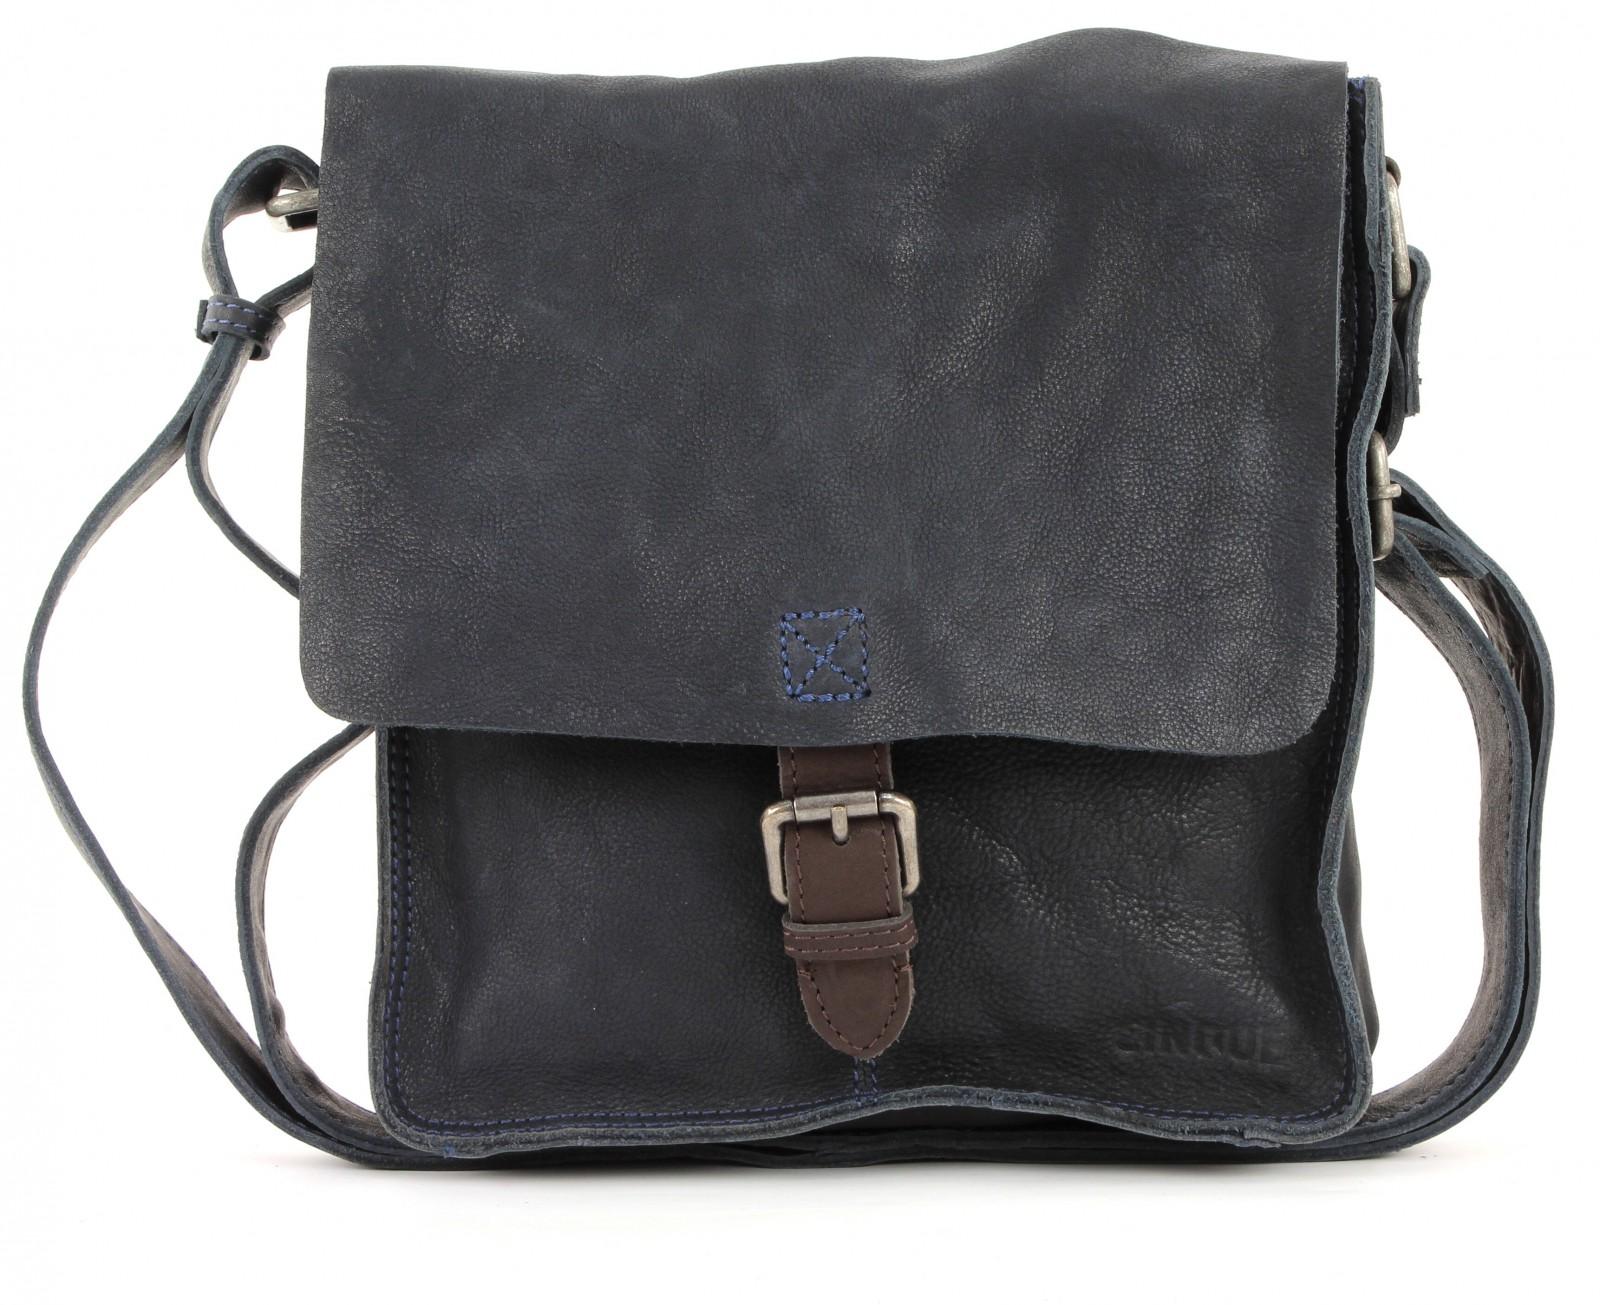 cinque tommaso crossbag tasche umh ngetasche schultertasche herren blau leder ebay. Black Bedroom Furniture Sets. Home Design Ideas